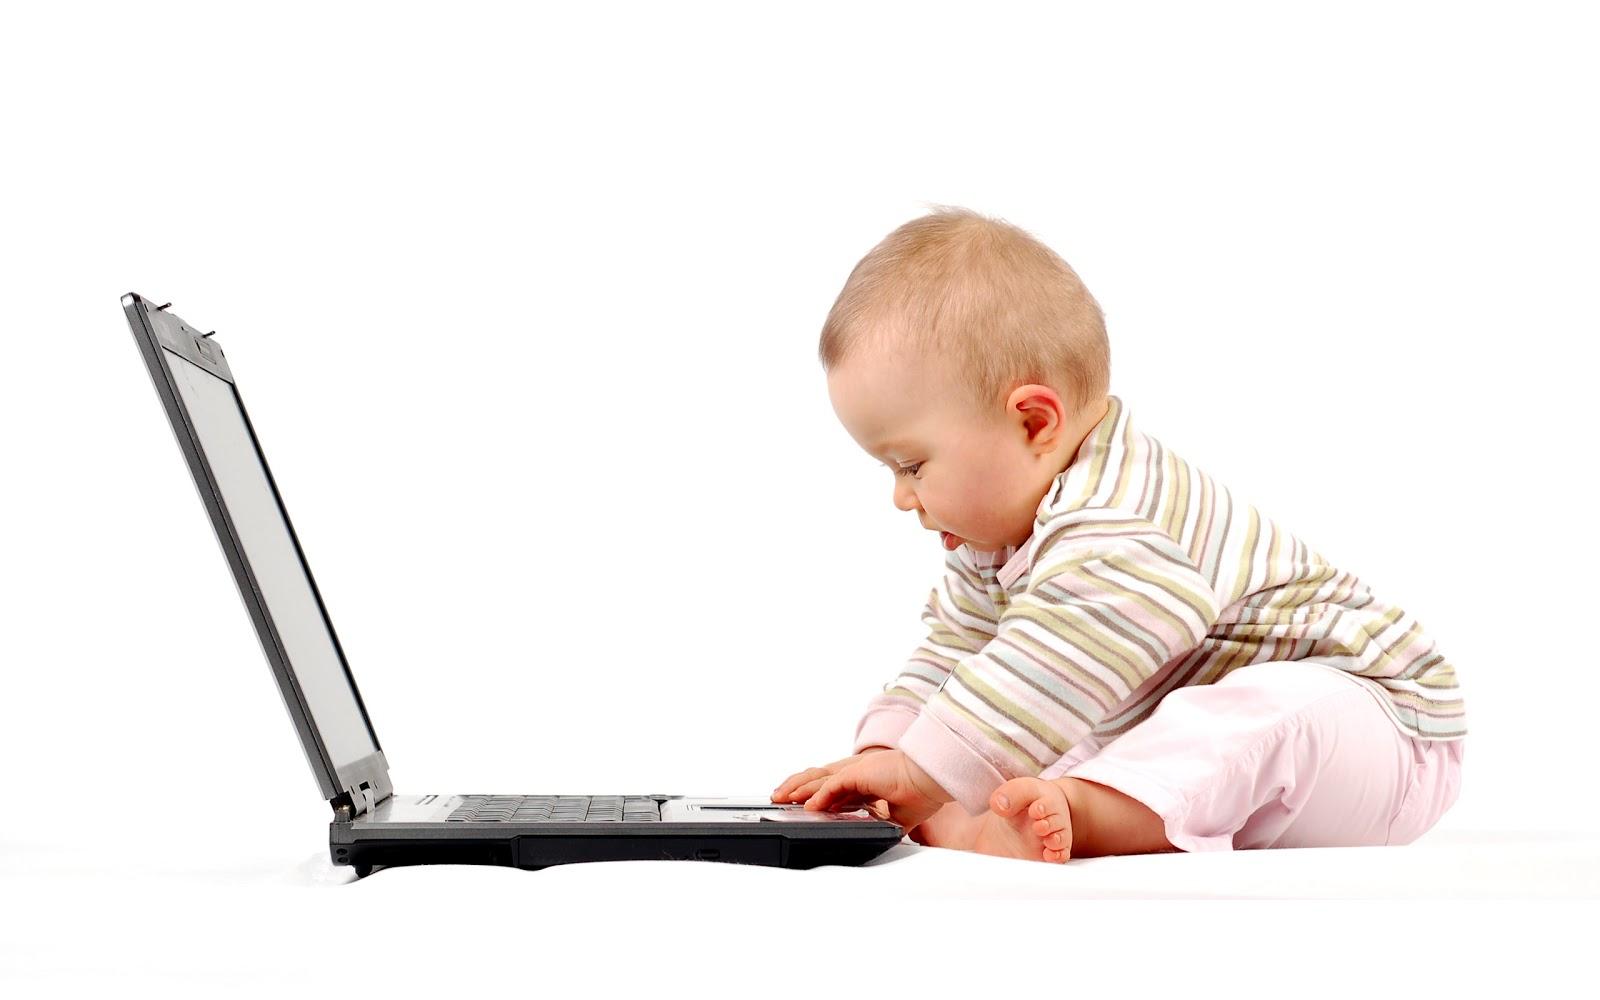 http://1.bp.blogspot.com/-BEUmwsCwYps/UNuxdqk2wzI/AAAAAAAAAYc/Yvu8wjxS8l0/s1600/Tech-baby.jpg